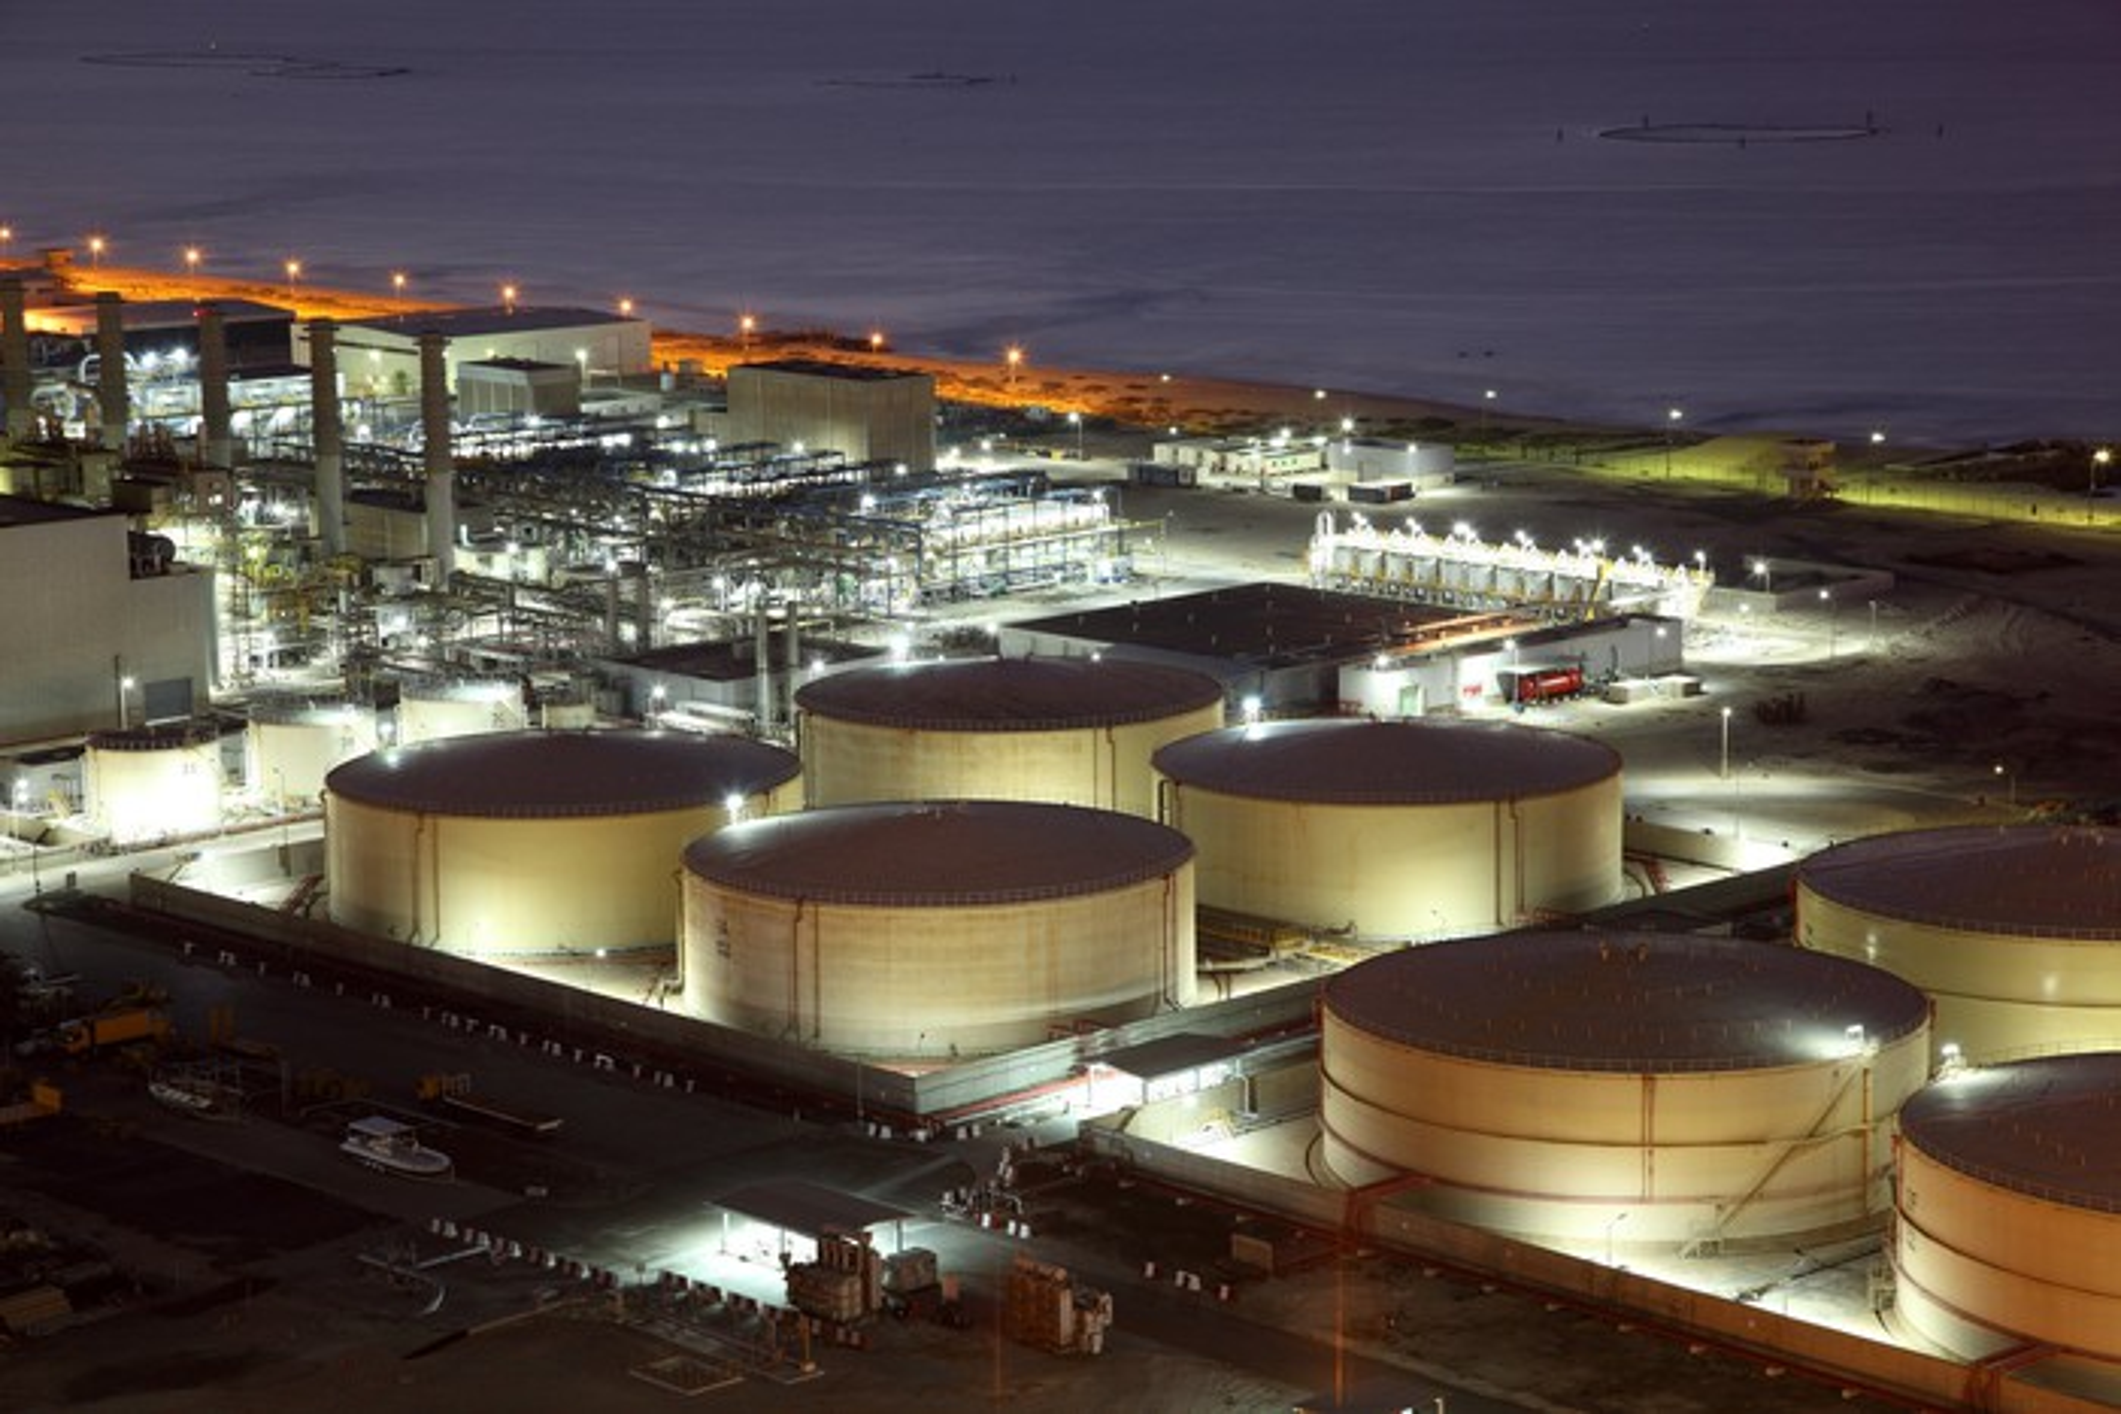 Marine oil terminal at night